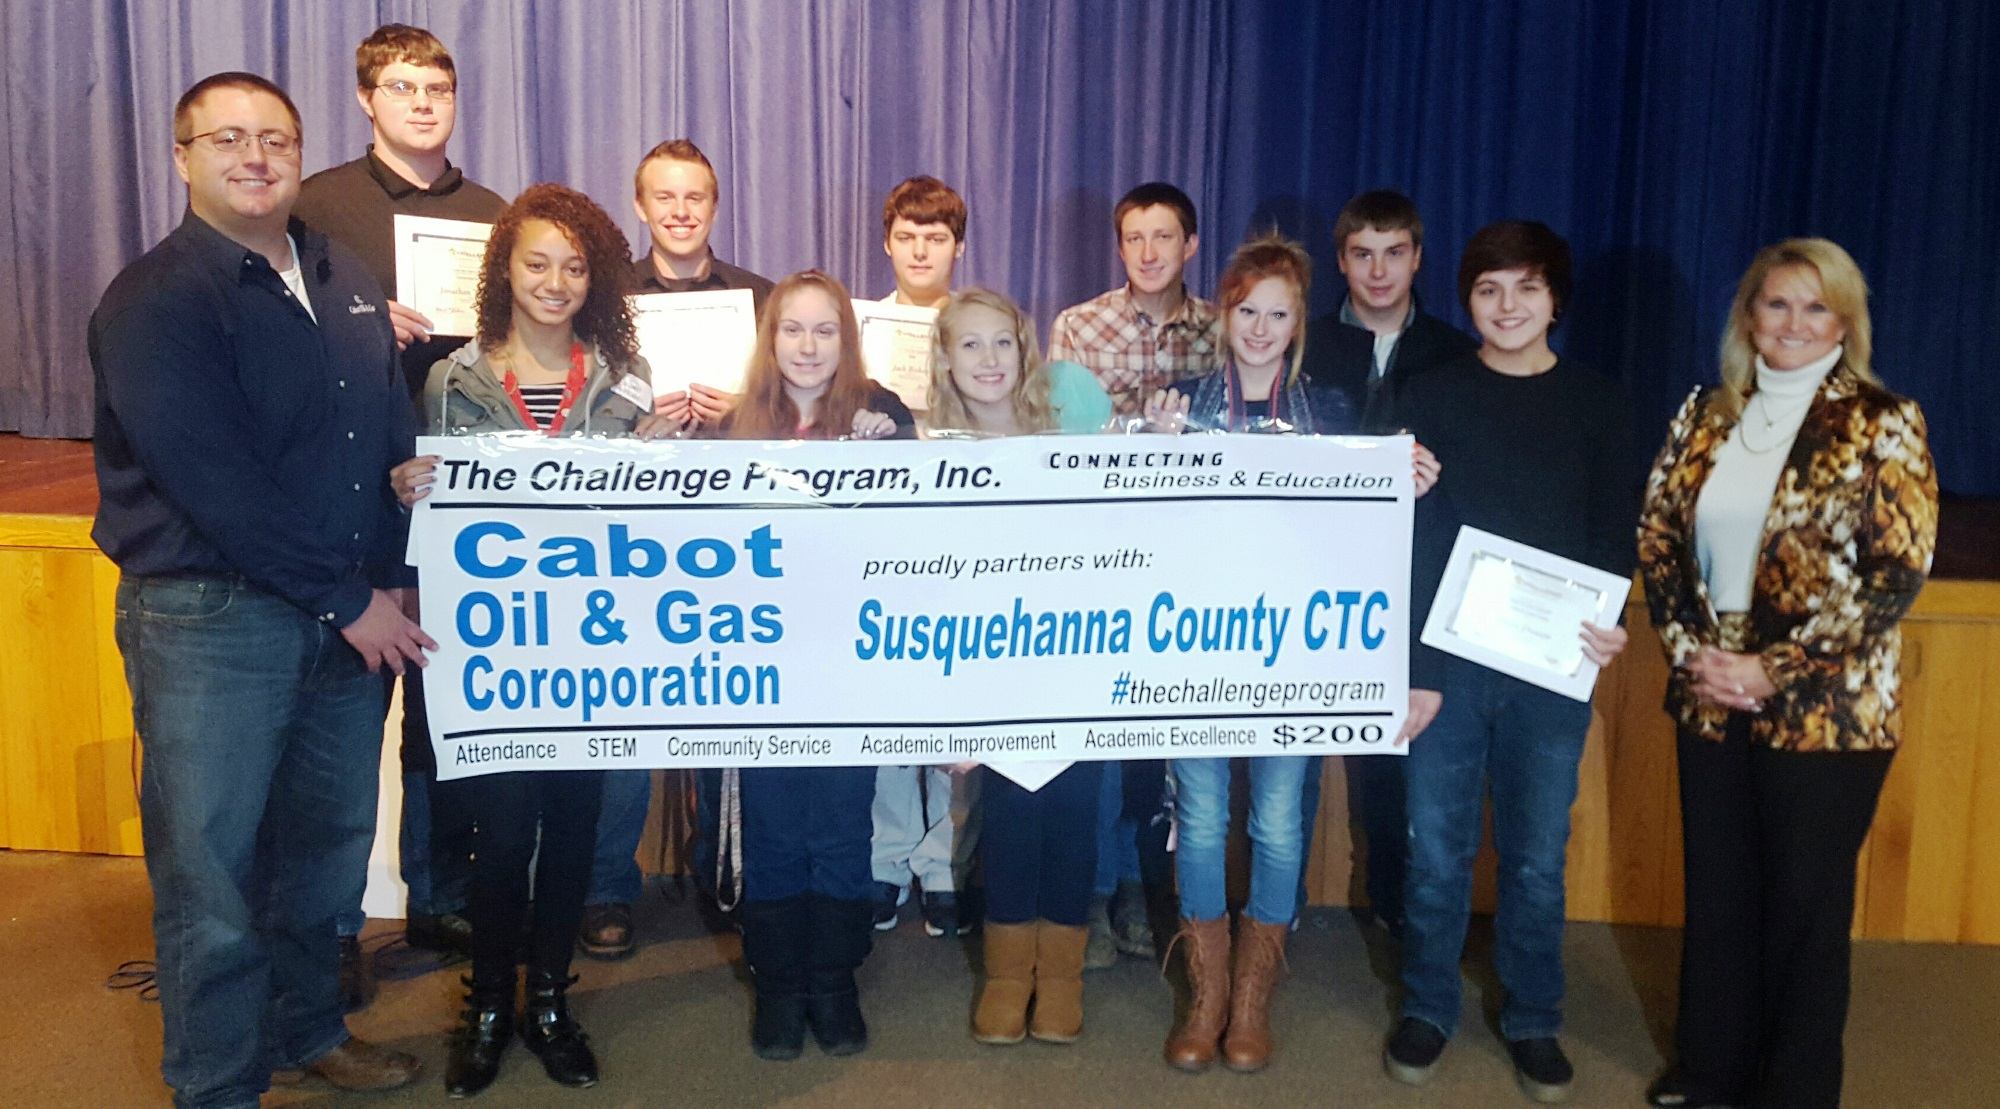 Susquehanna County CTC